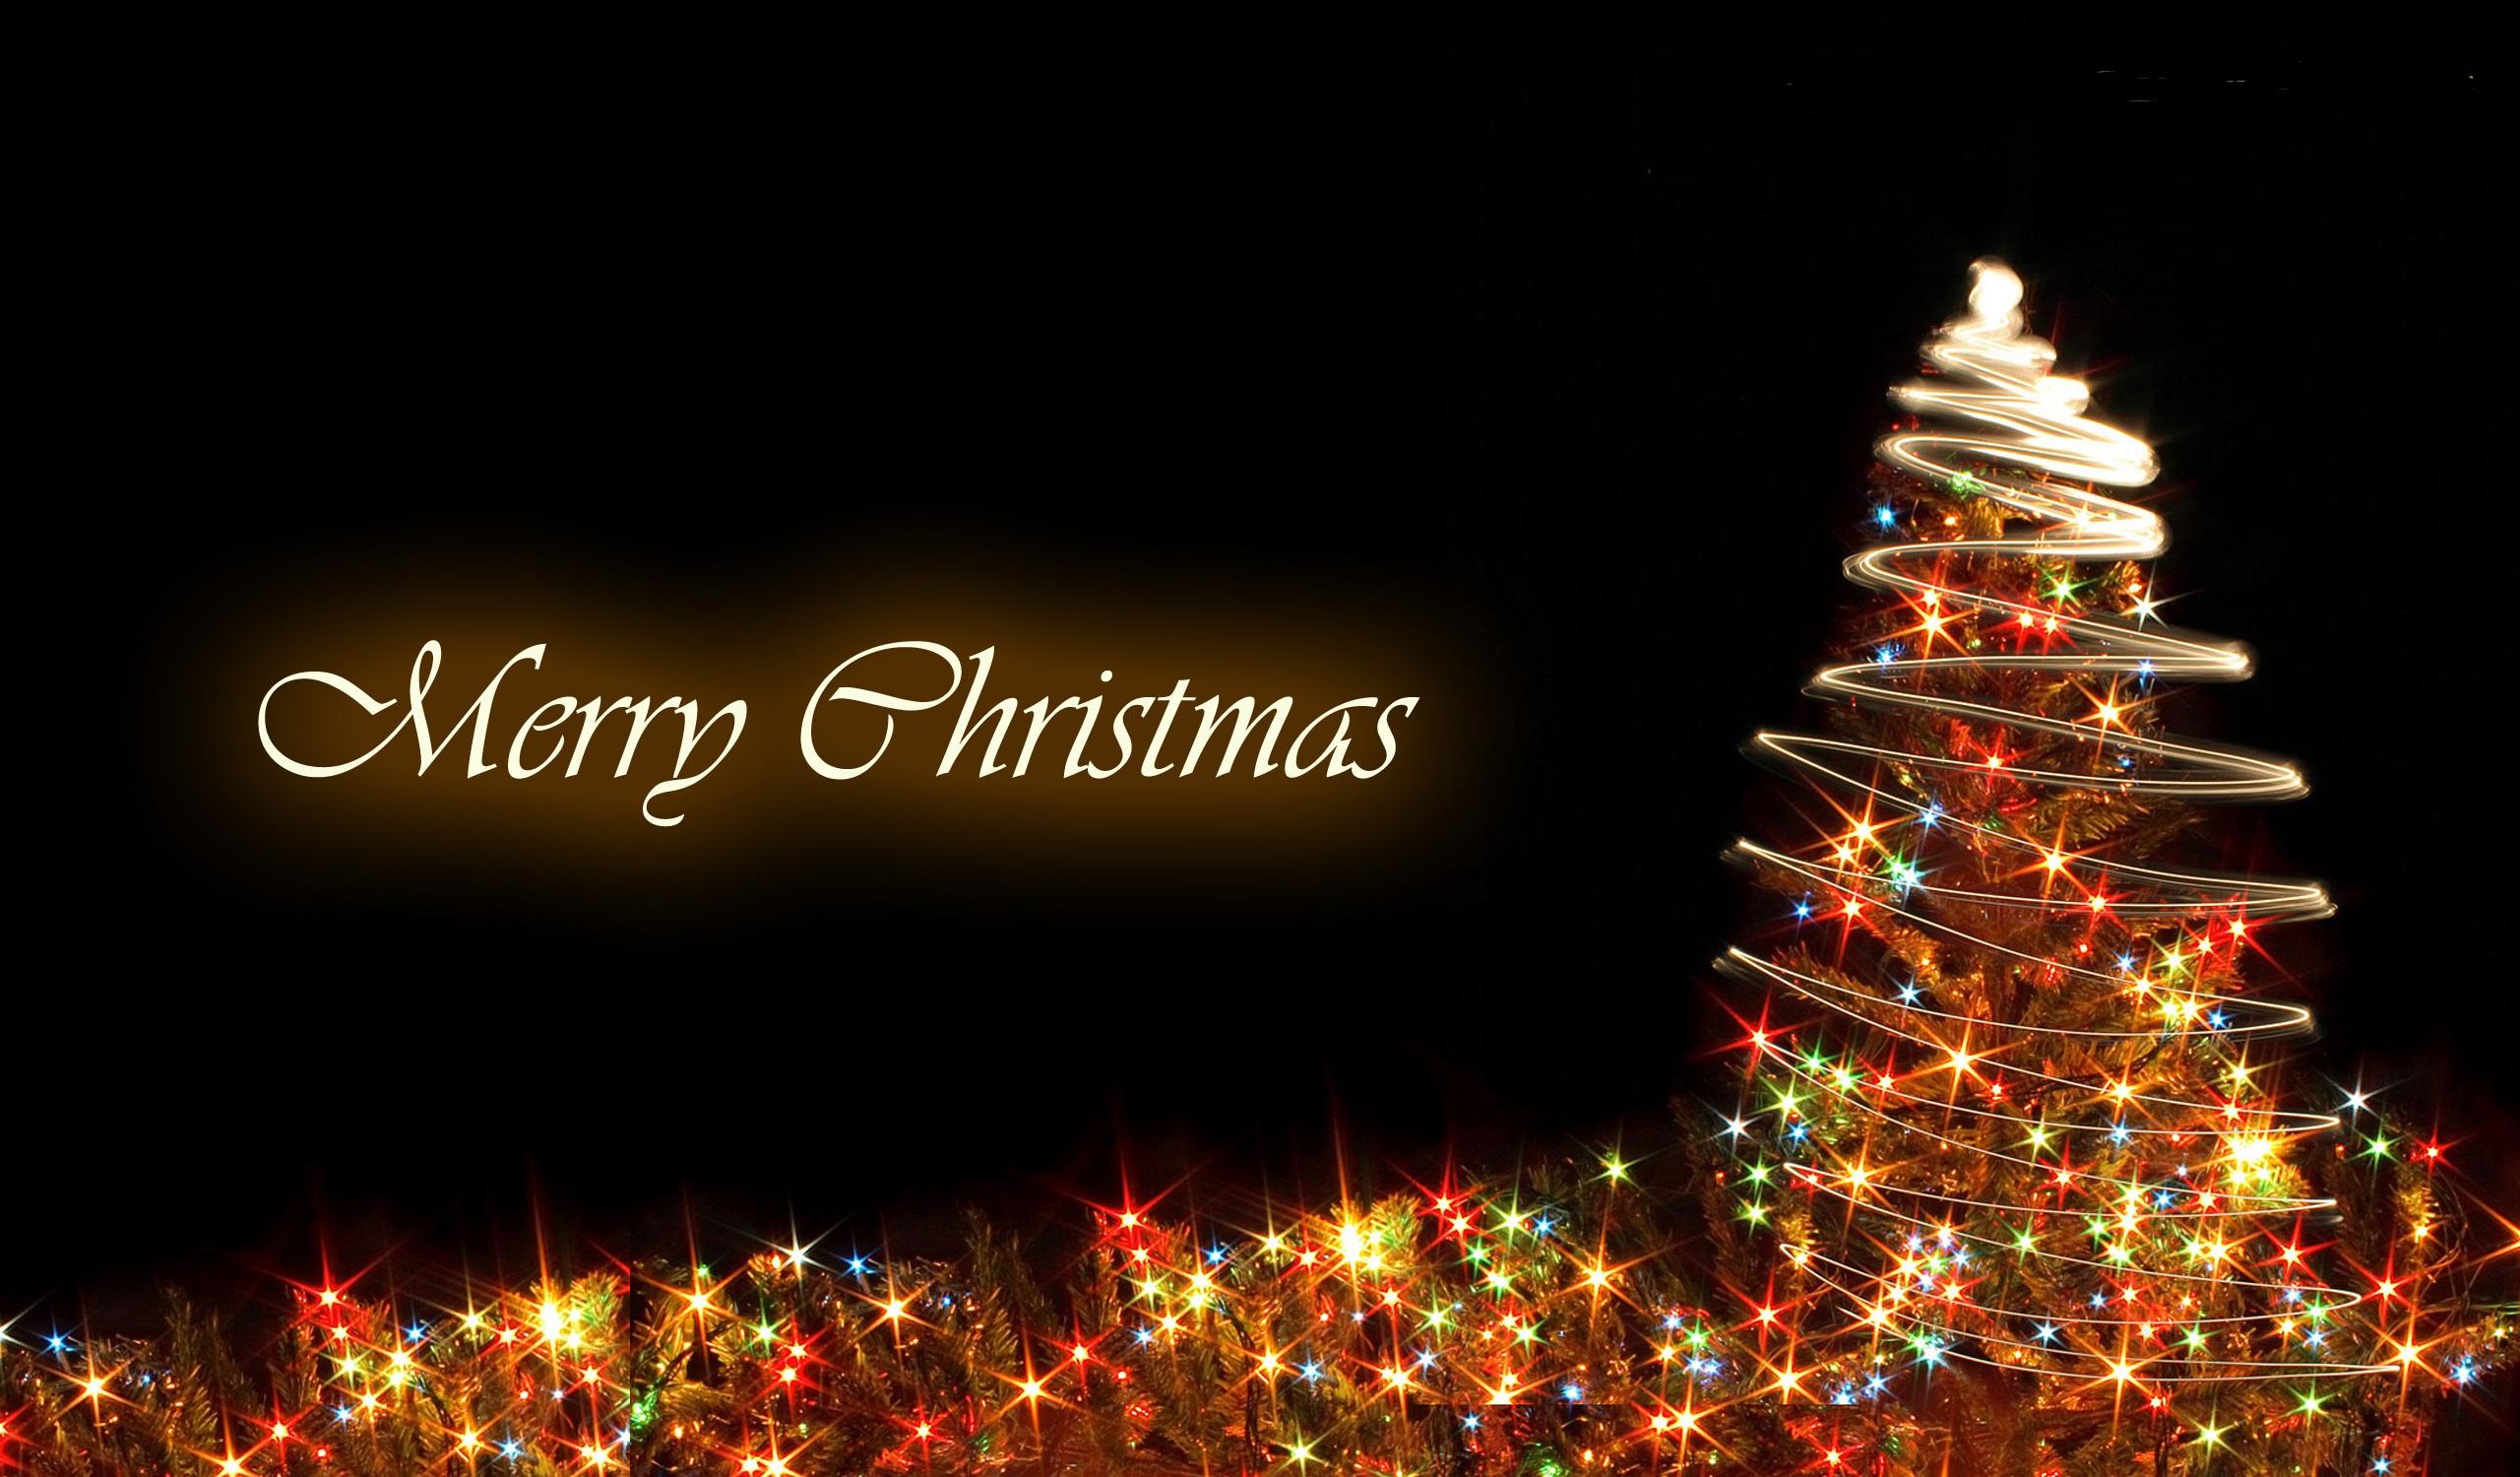 Merry Christmas Wallpapers HD 2017 free download | PixelsTalk Net